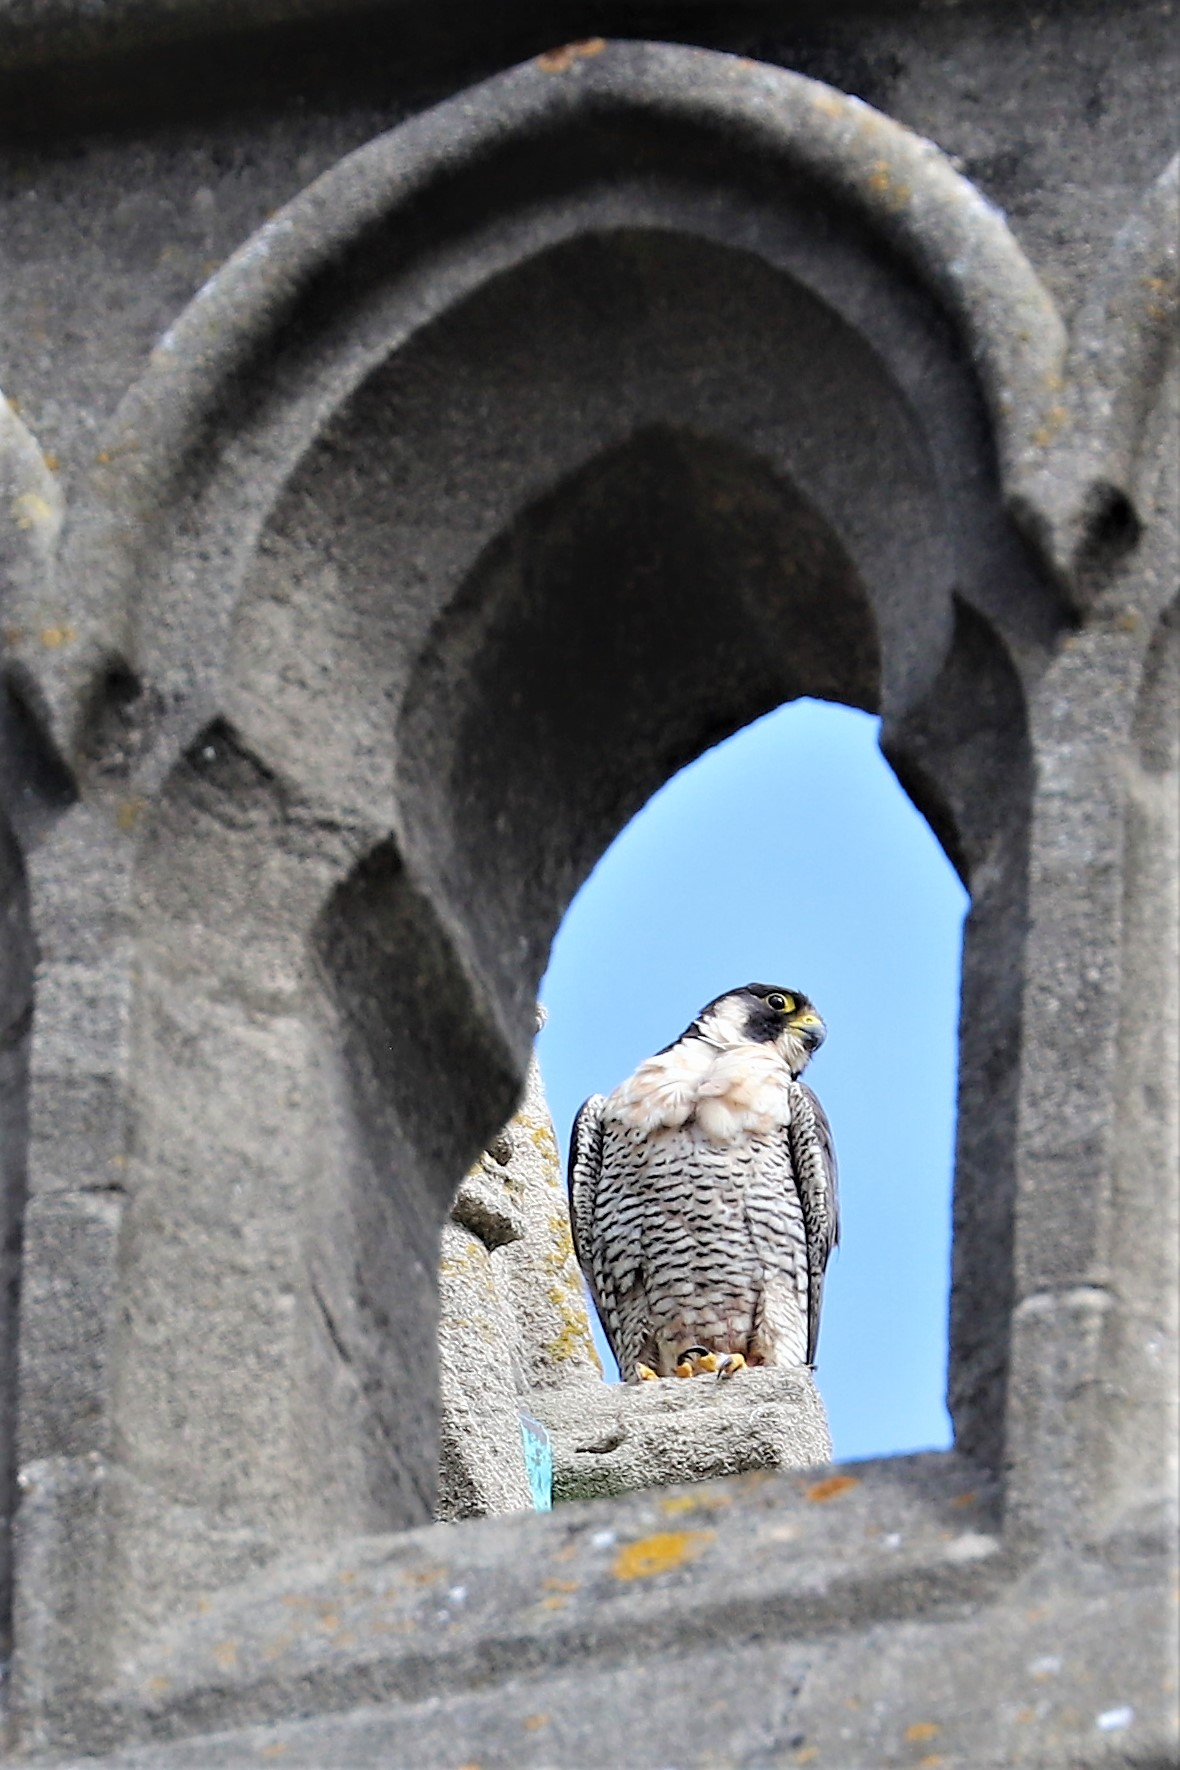 Peregrine Falcon by Brian Cartwright 28th July Andover